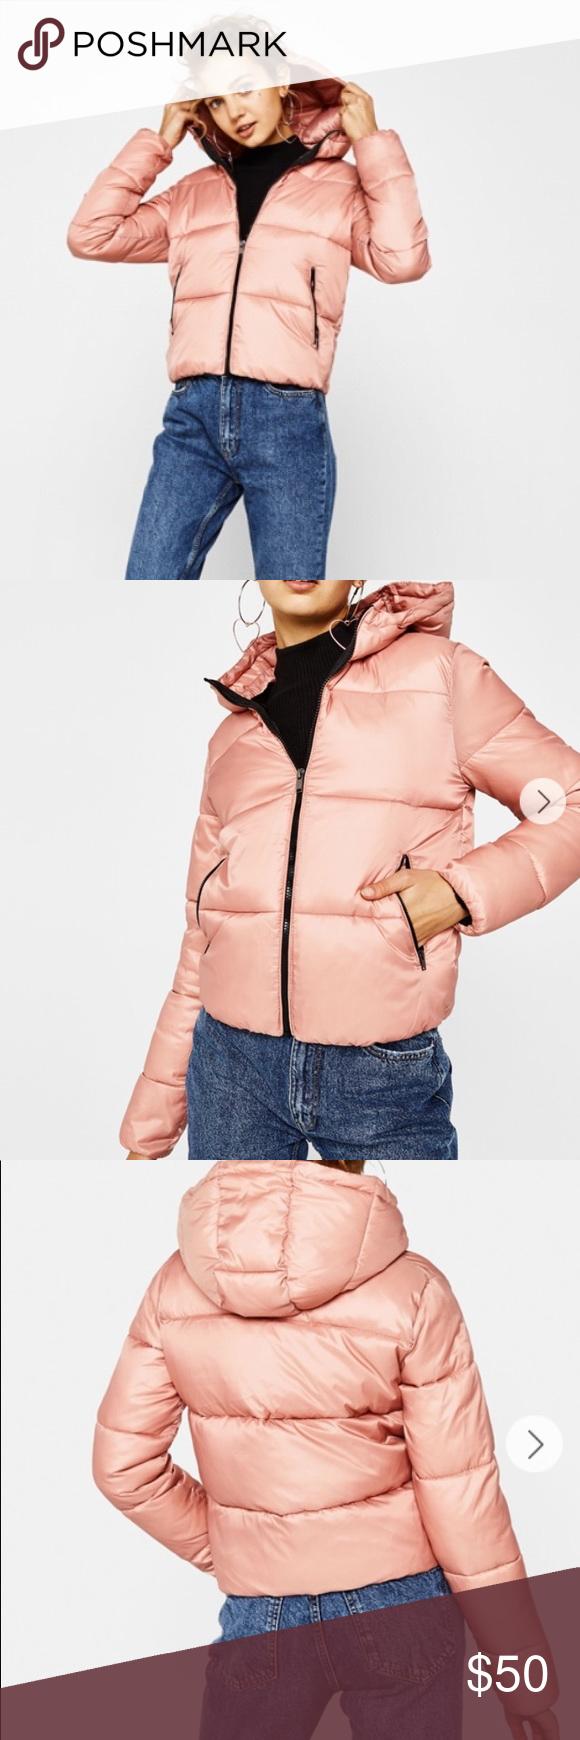 Bershka Puffer Jacket In Blush M Jackets Bershka Jacket Clothes Design [ 1740 x 580 Pixel ]